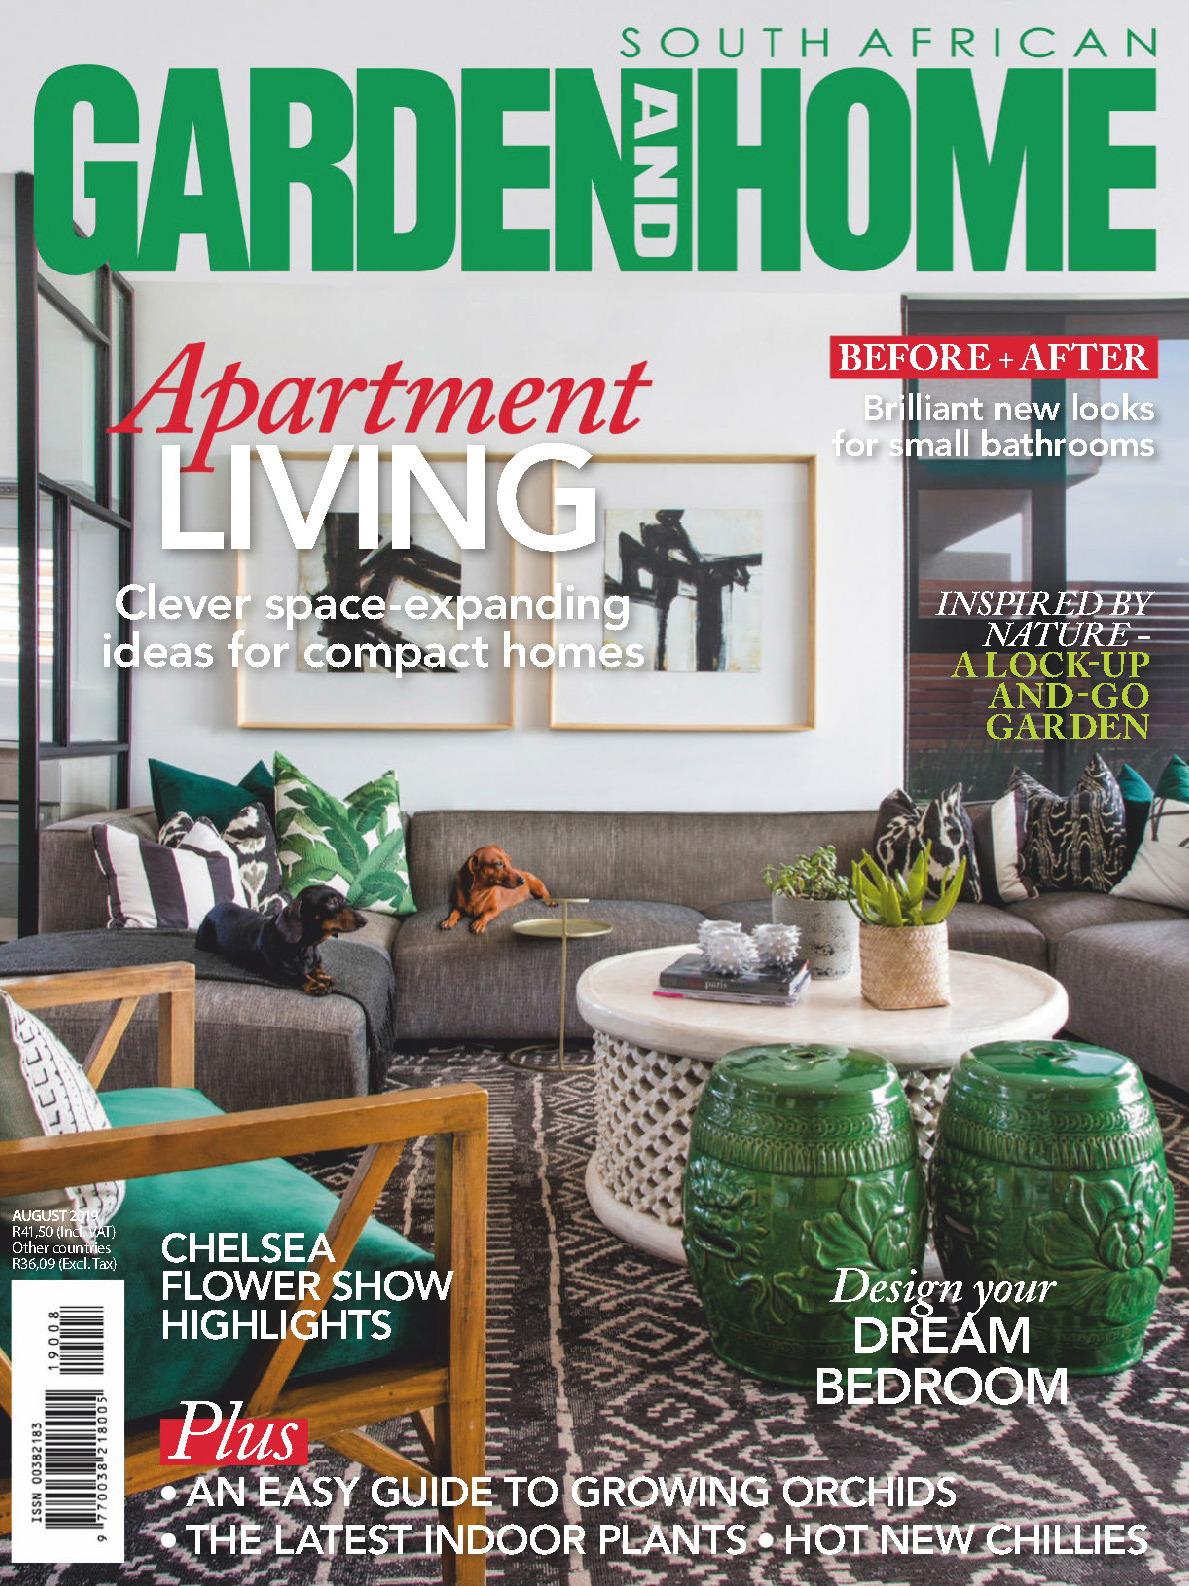 《Garden and Home》南非版時尚家居雜志2019年08月號